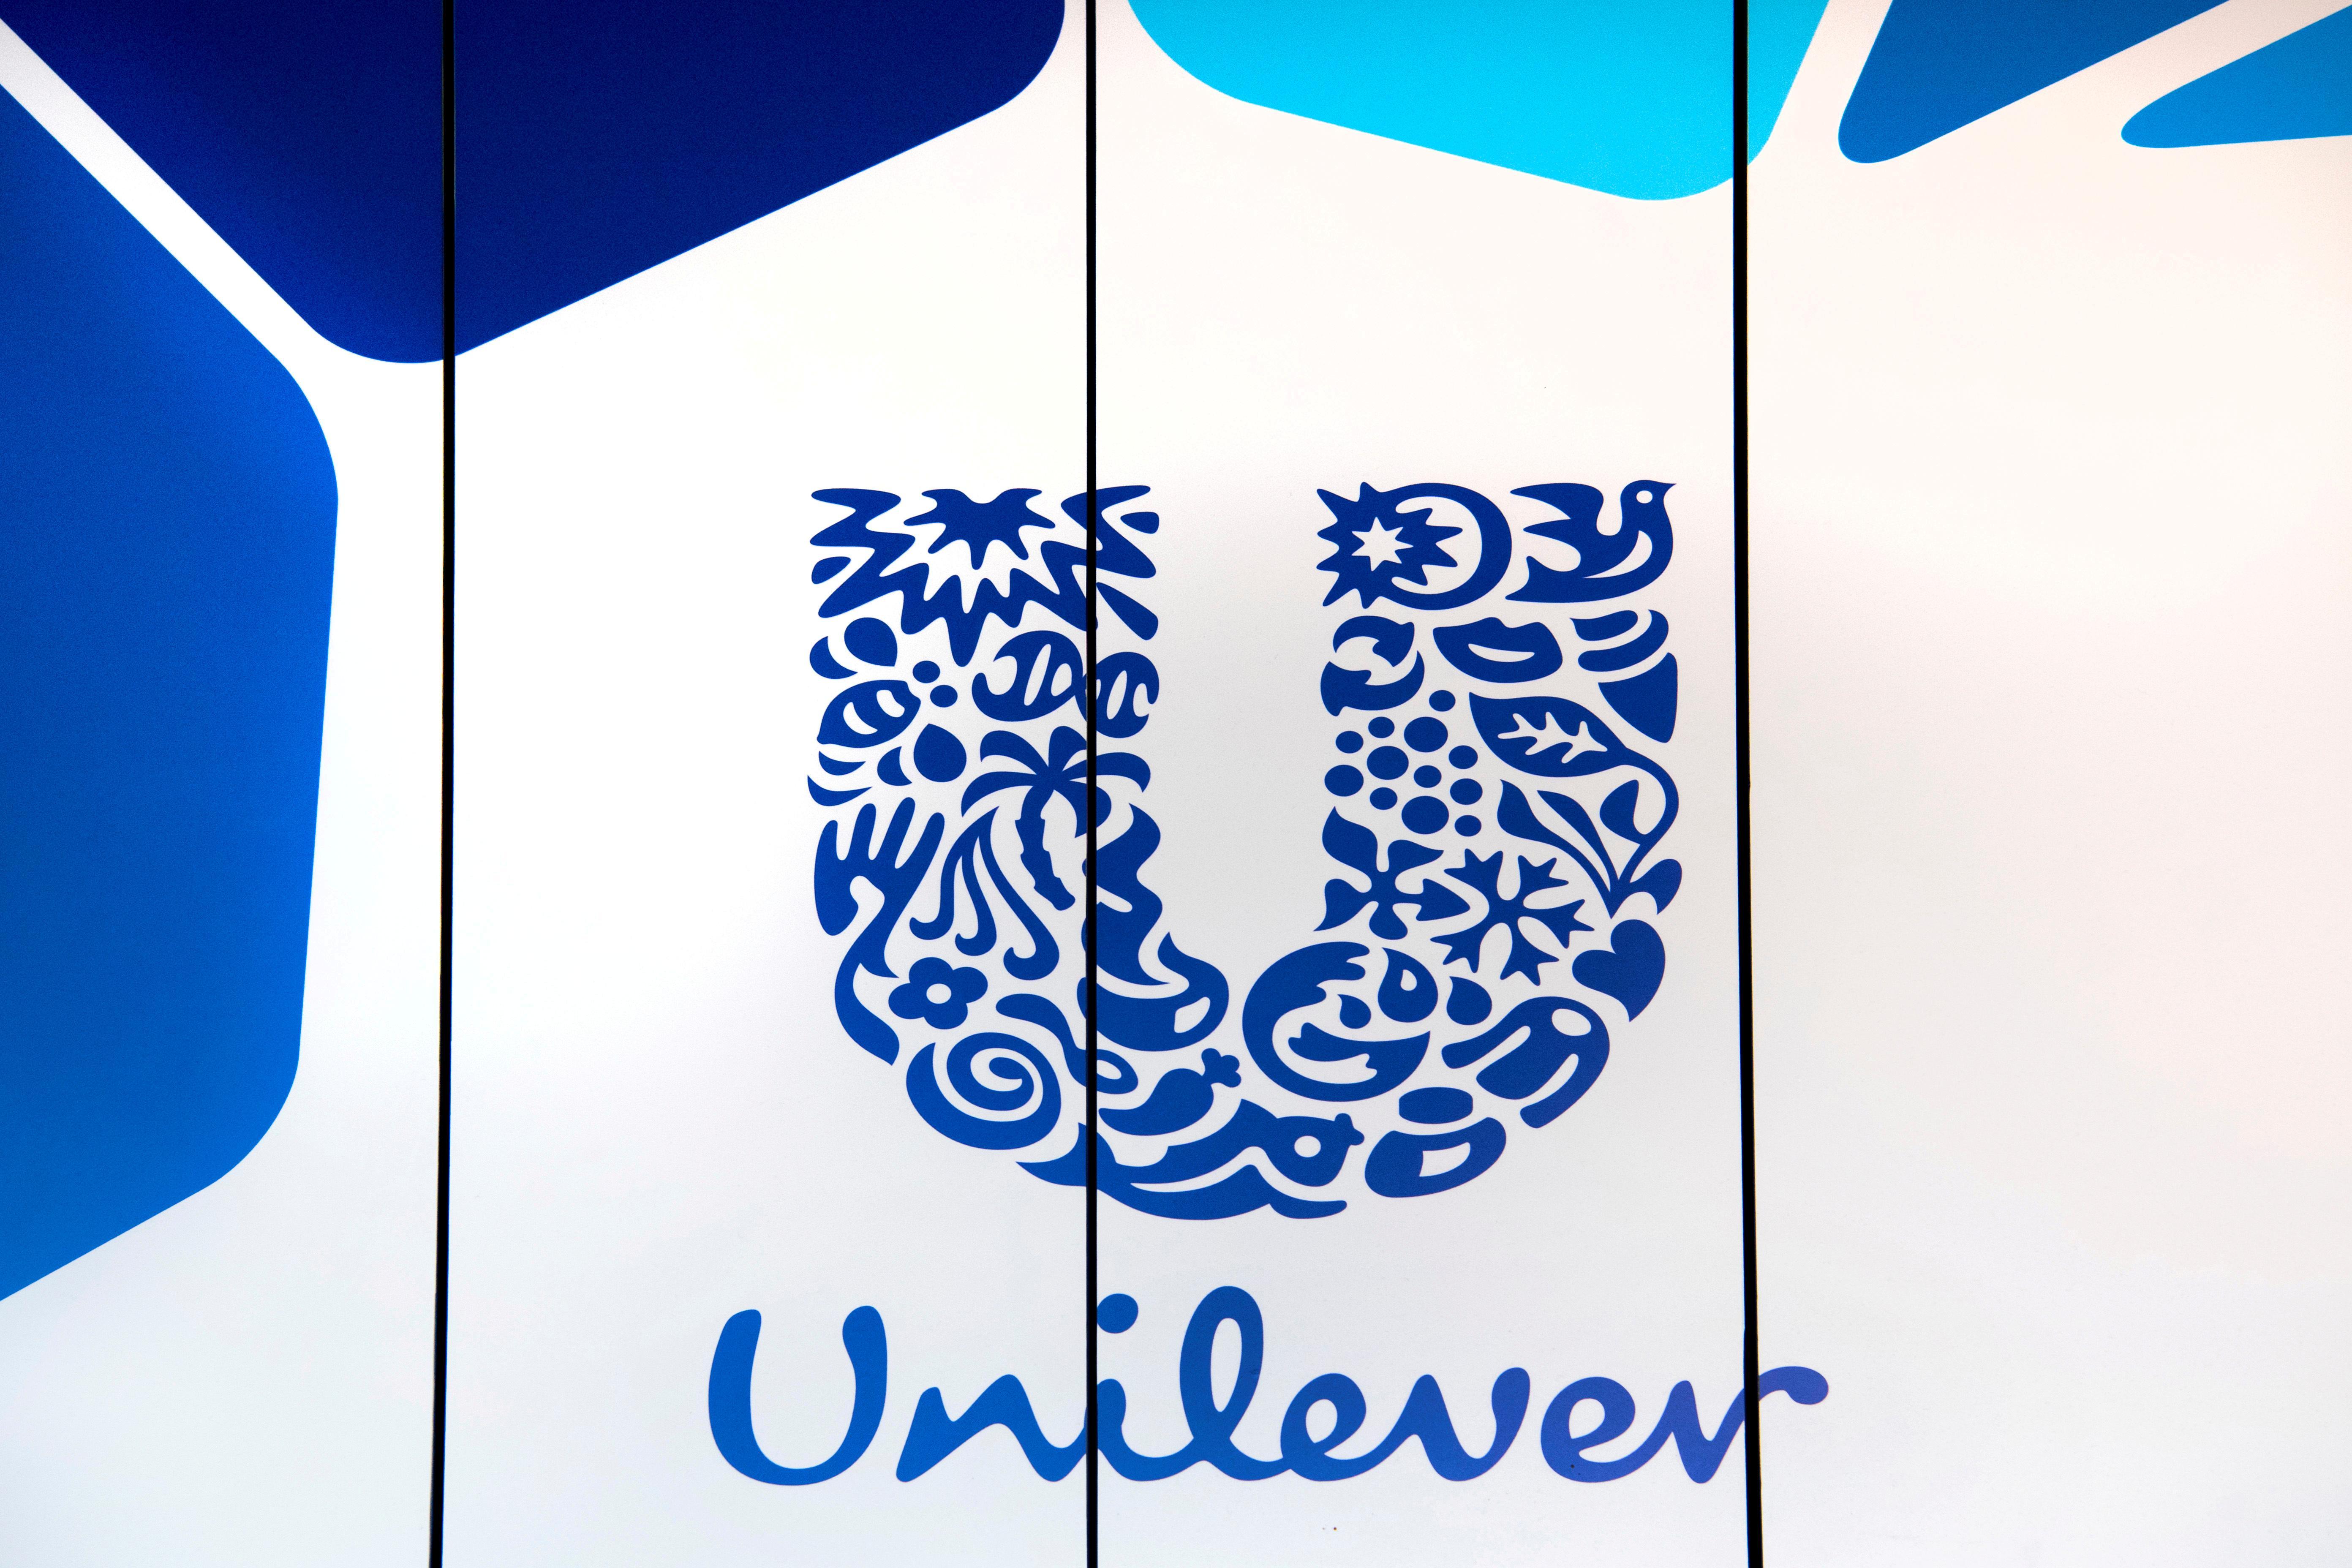 Unilever appoints Nils Andersen as chairman, replacing Dekkers